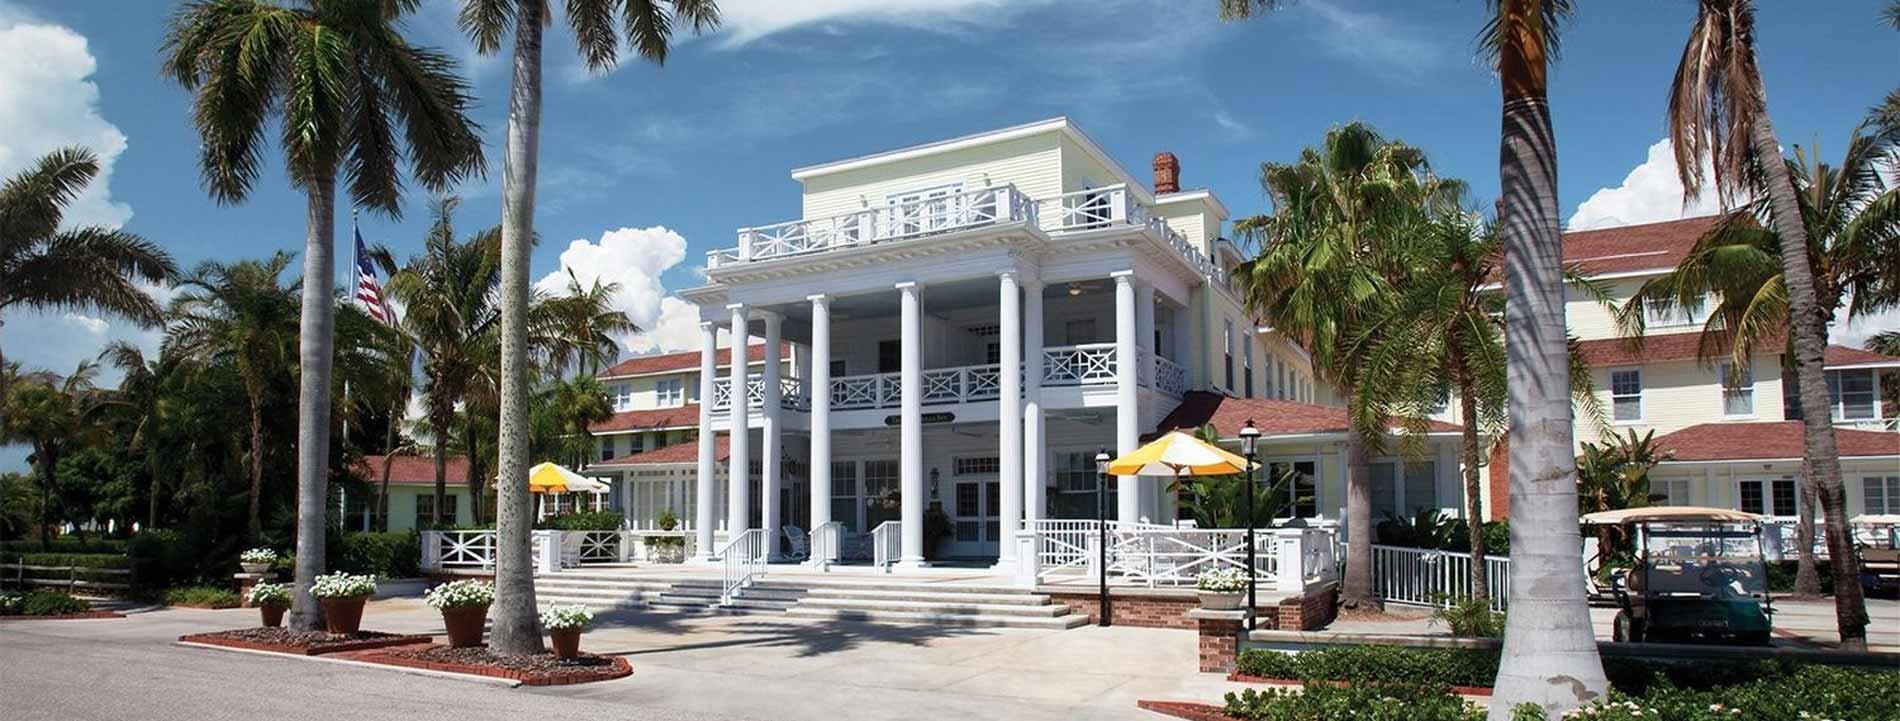 Gasparilla Inn and Club in Boca Grande, Florida.